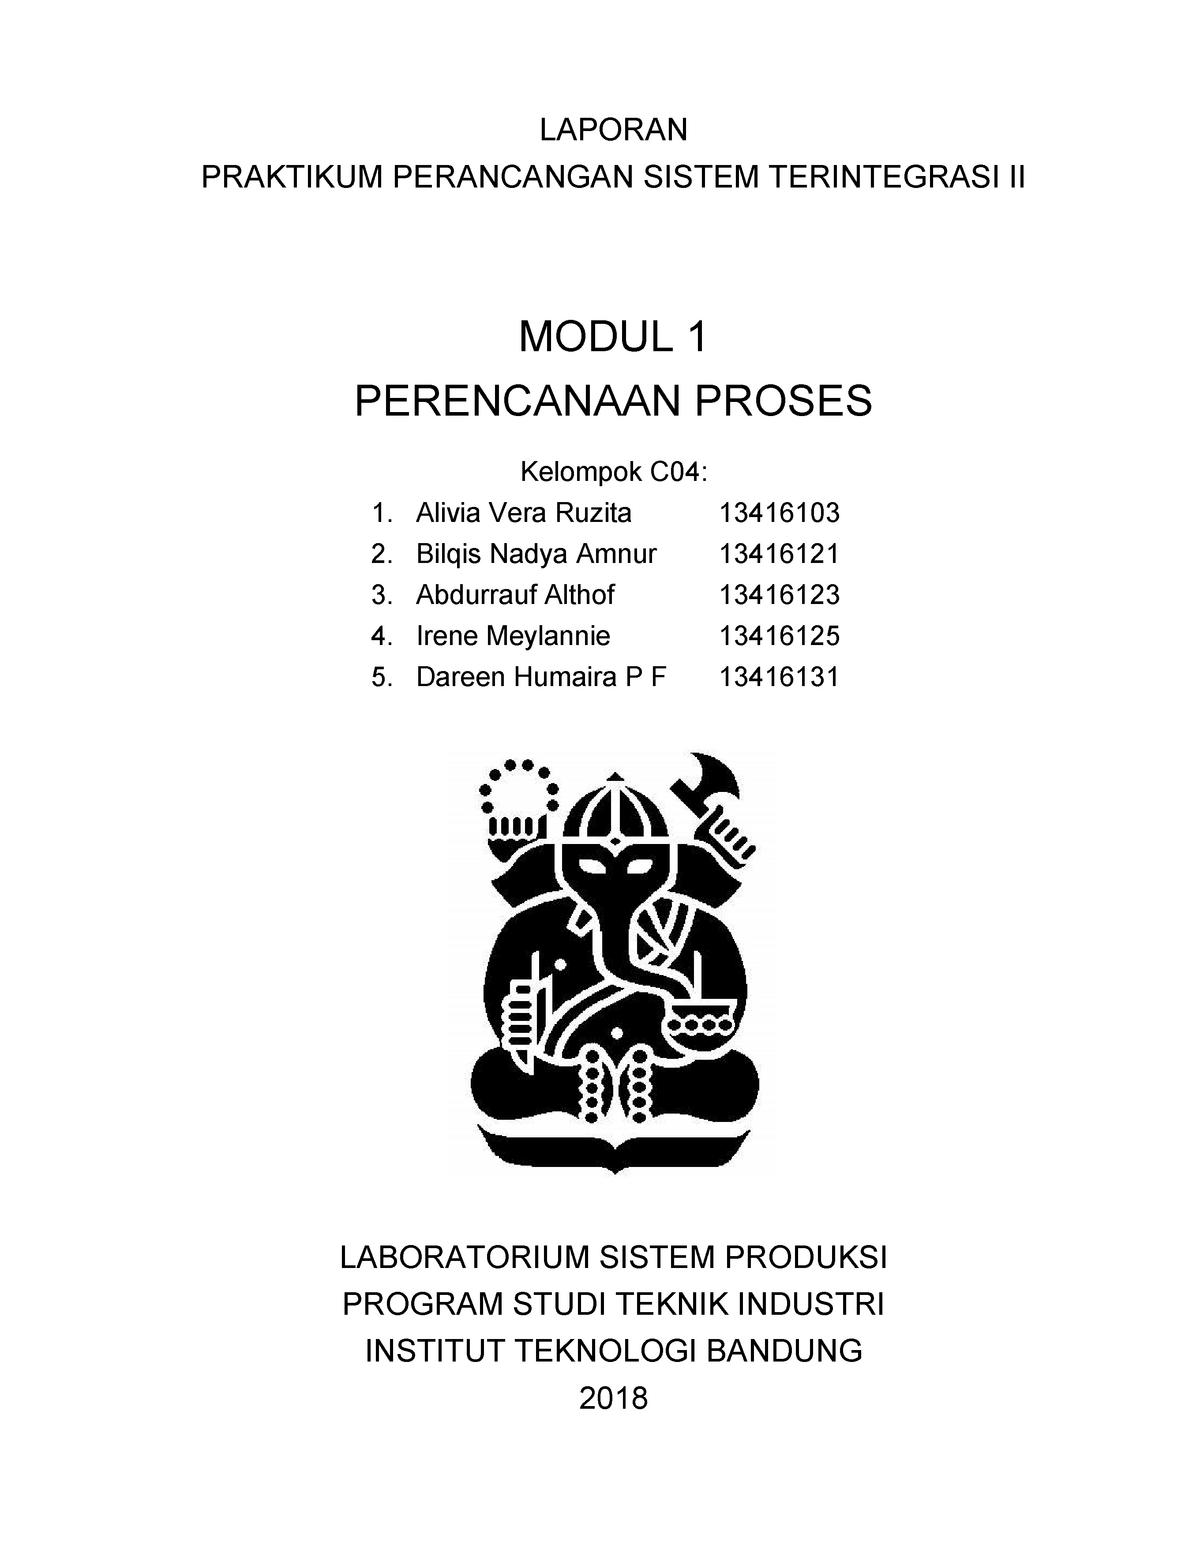 Laporan Modul 1 Ppst 2 Kelompok C04 Studocu